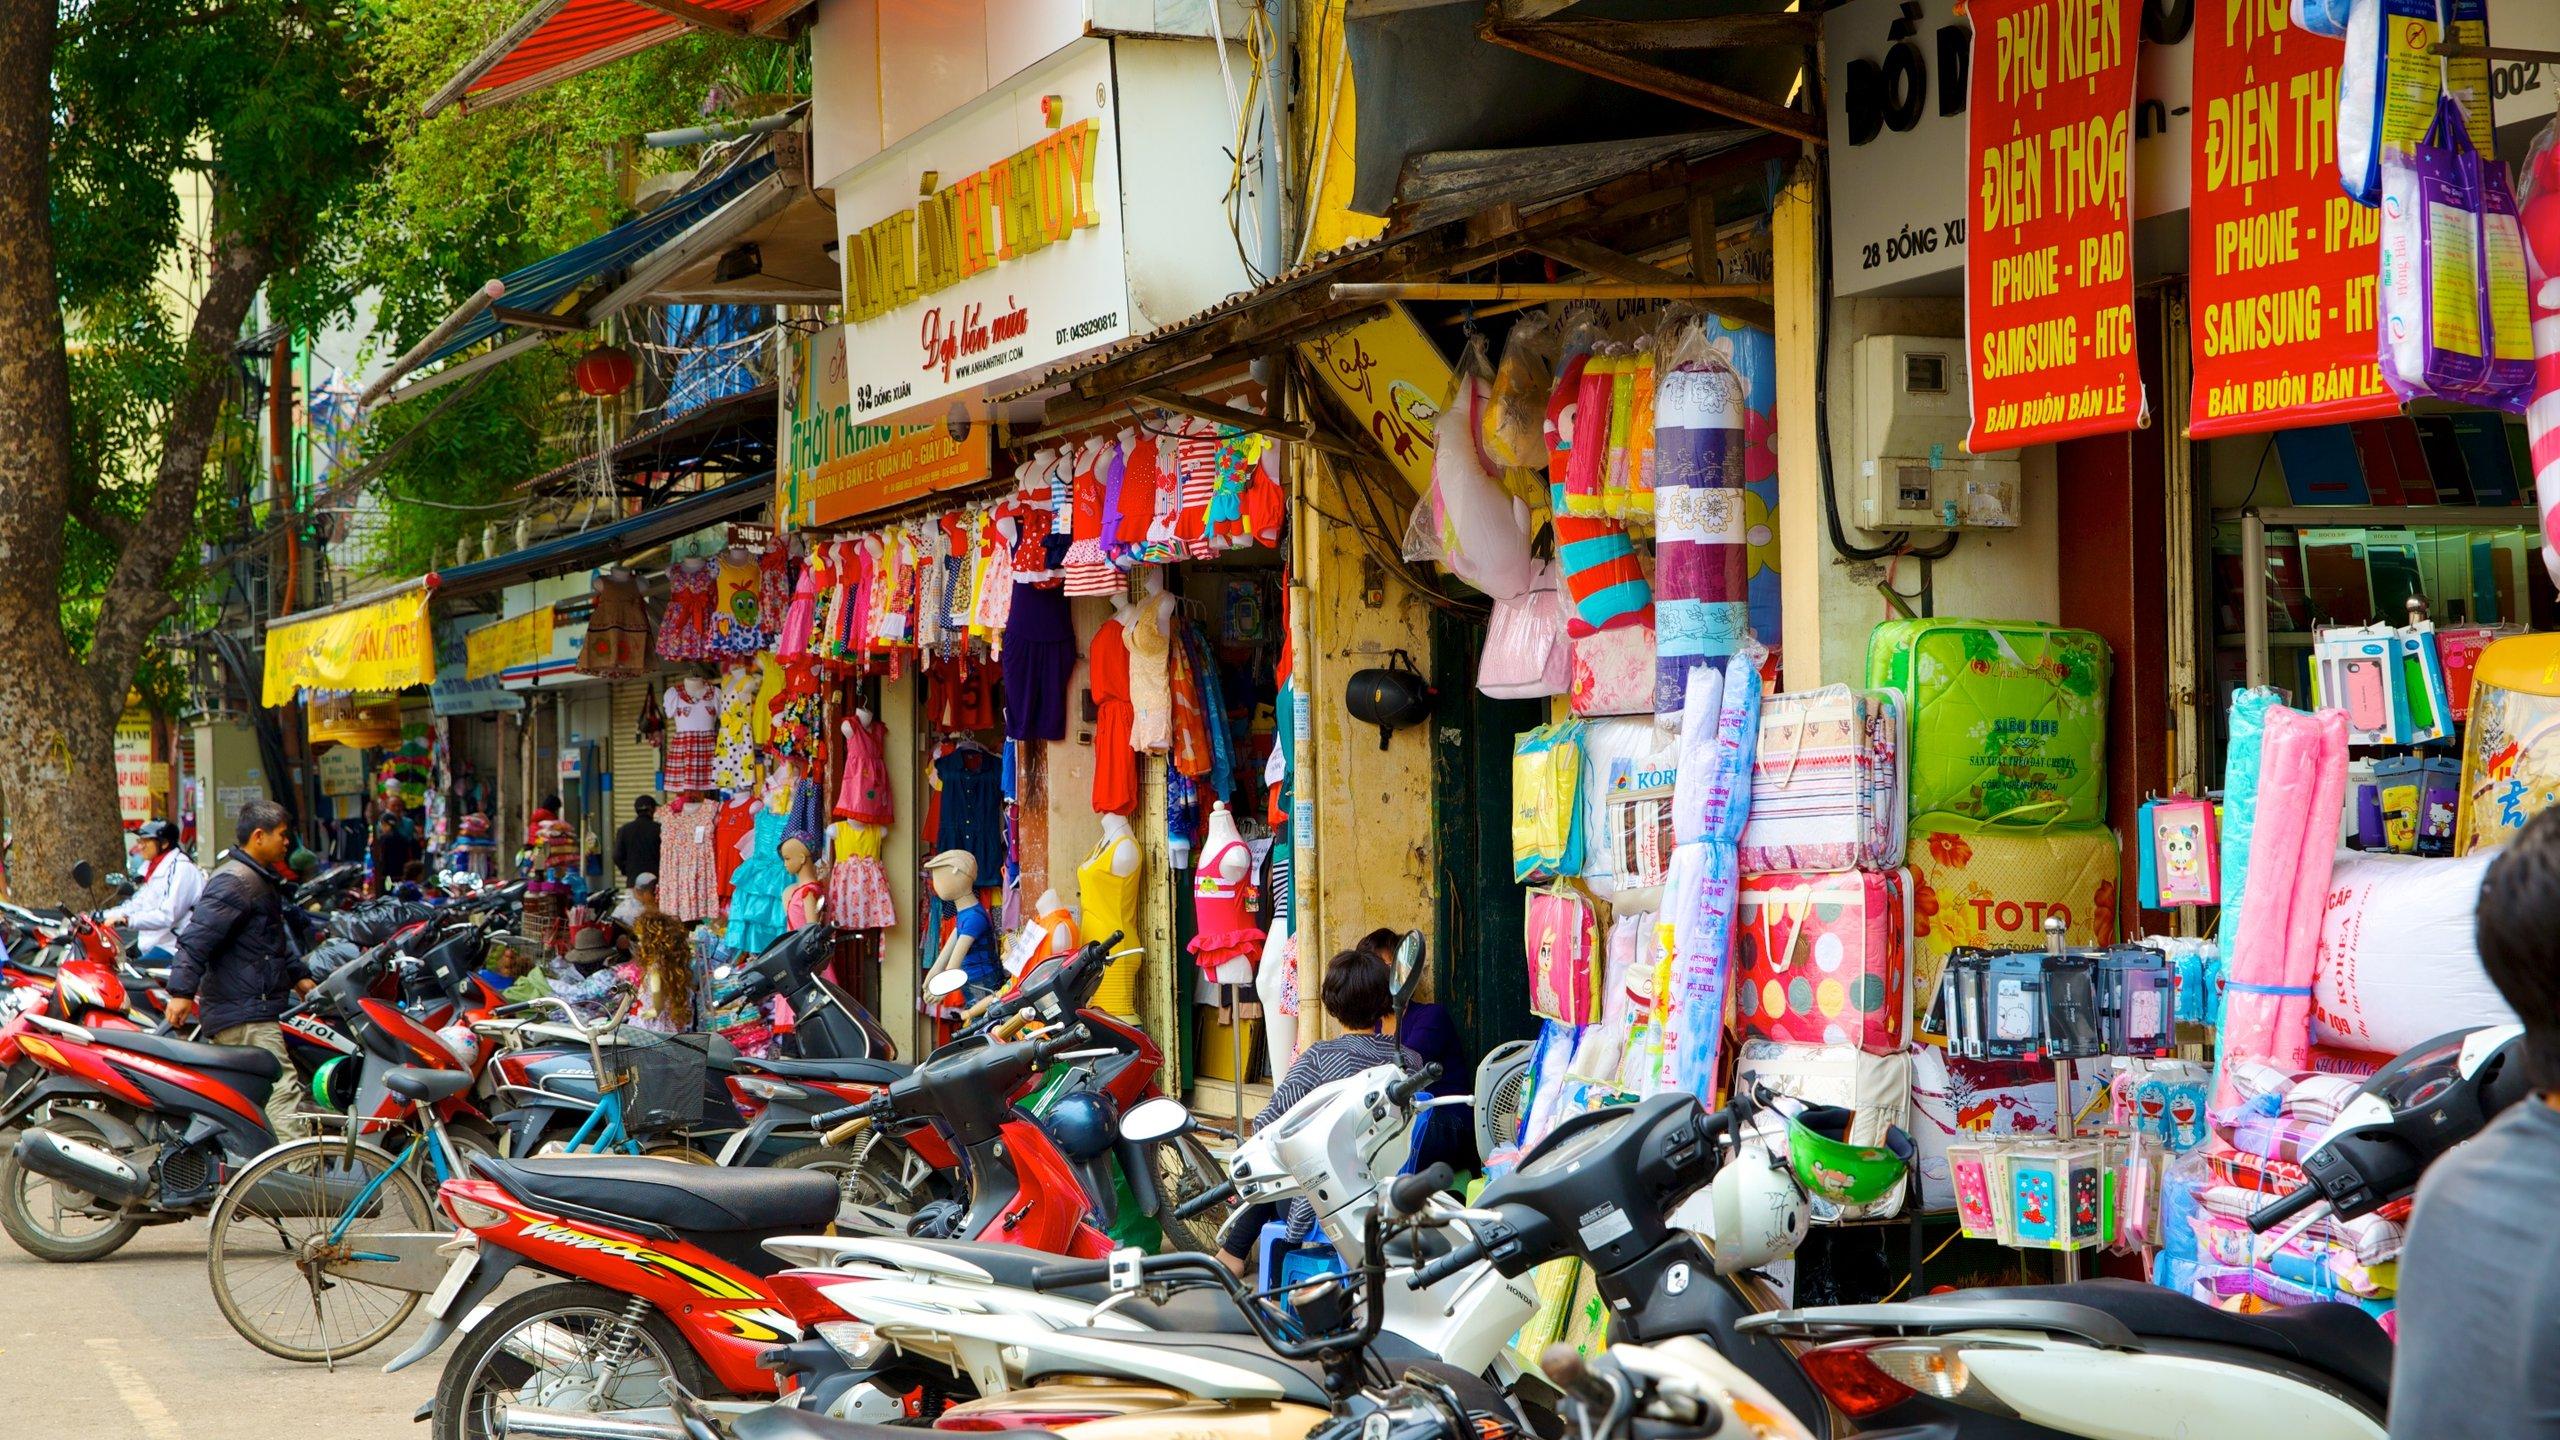 Dong Xuan Market, Hanoi, Vietnam